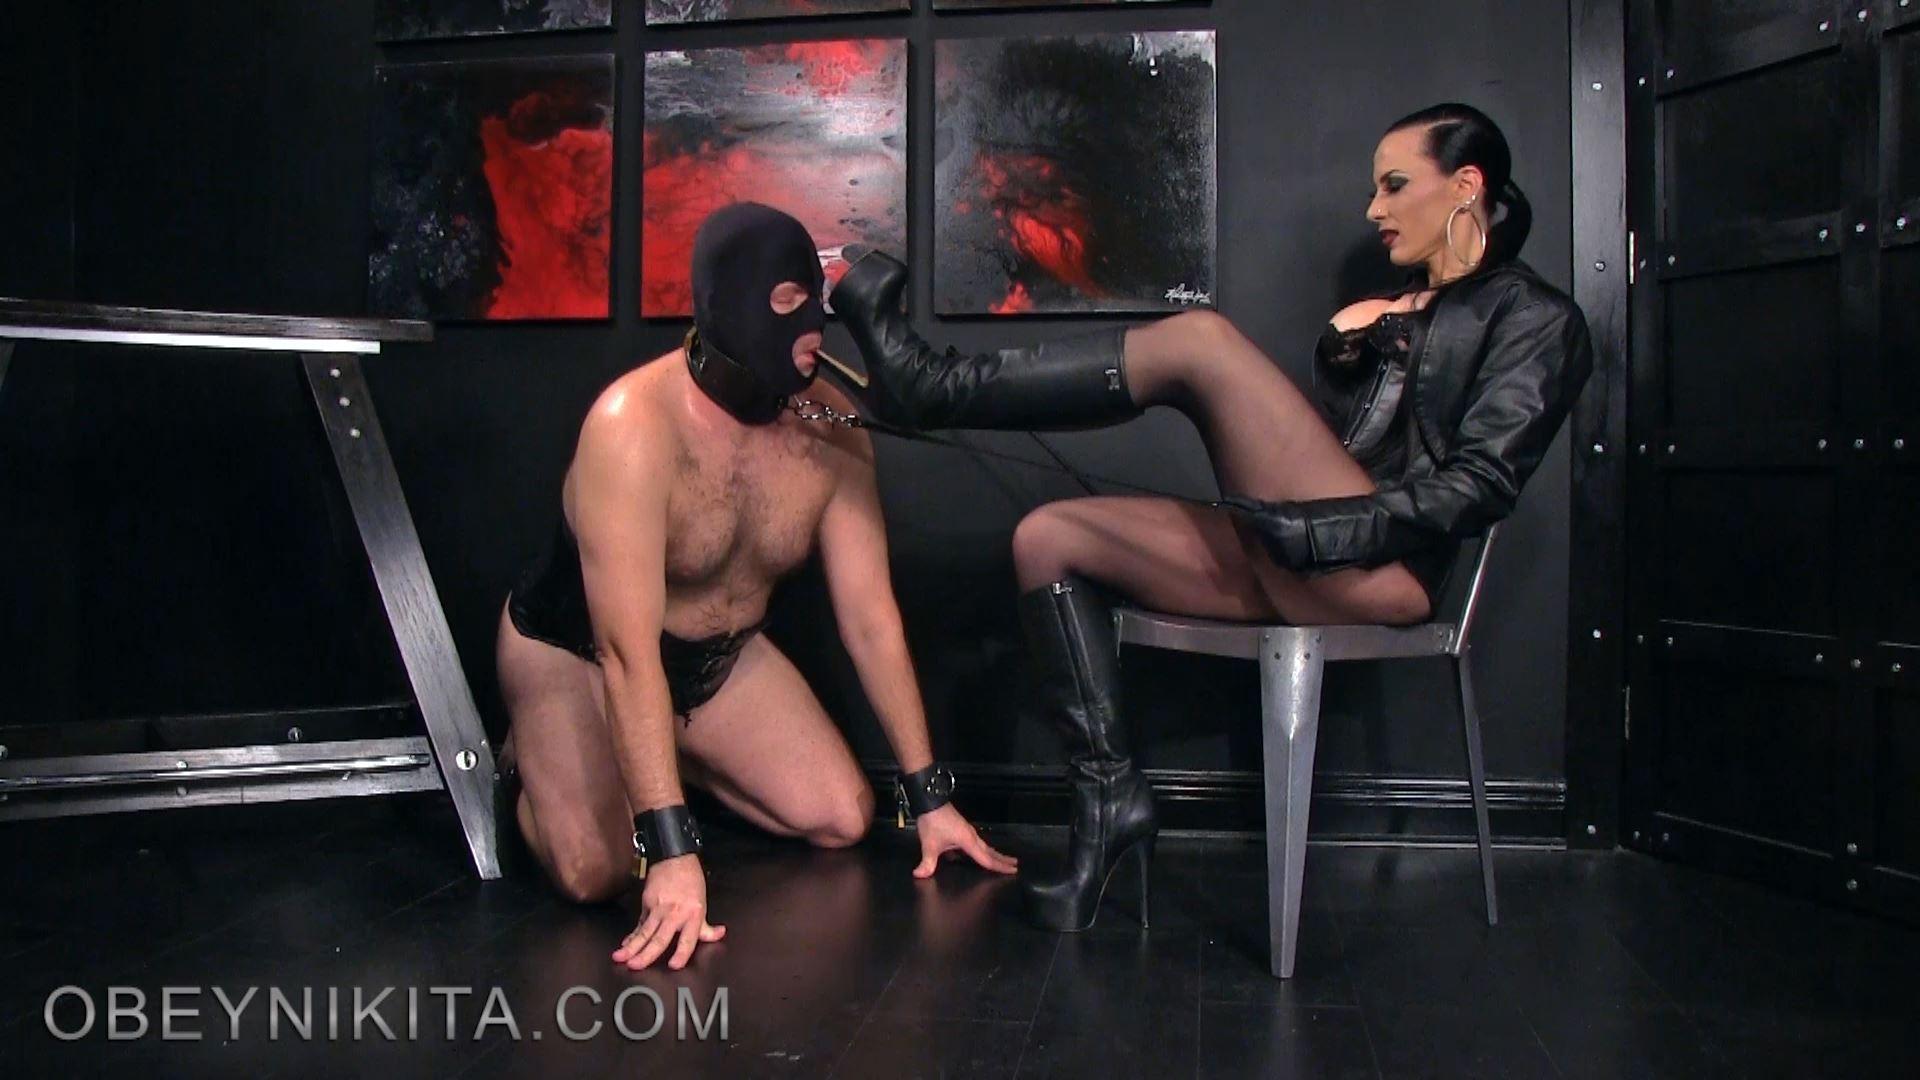 Mistress Nikita In Scene: Lick My Leather Covered Platform Knee Boots - OBEYNIKITA - FULL HD/1080p/MP4